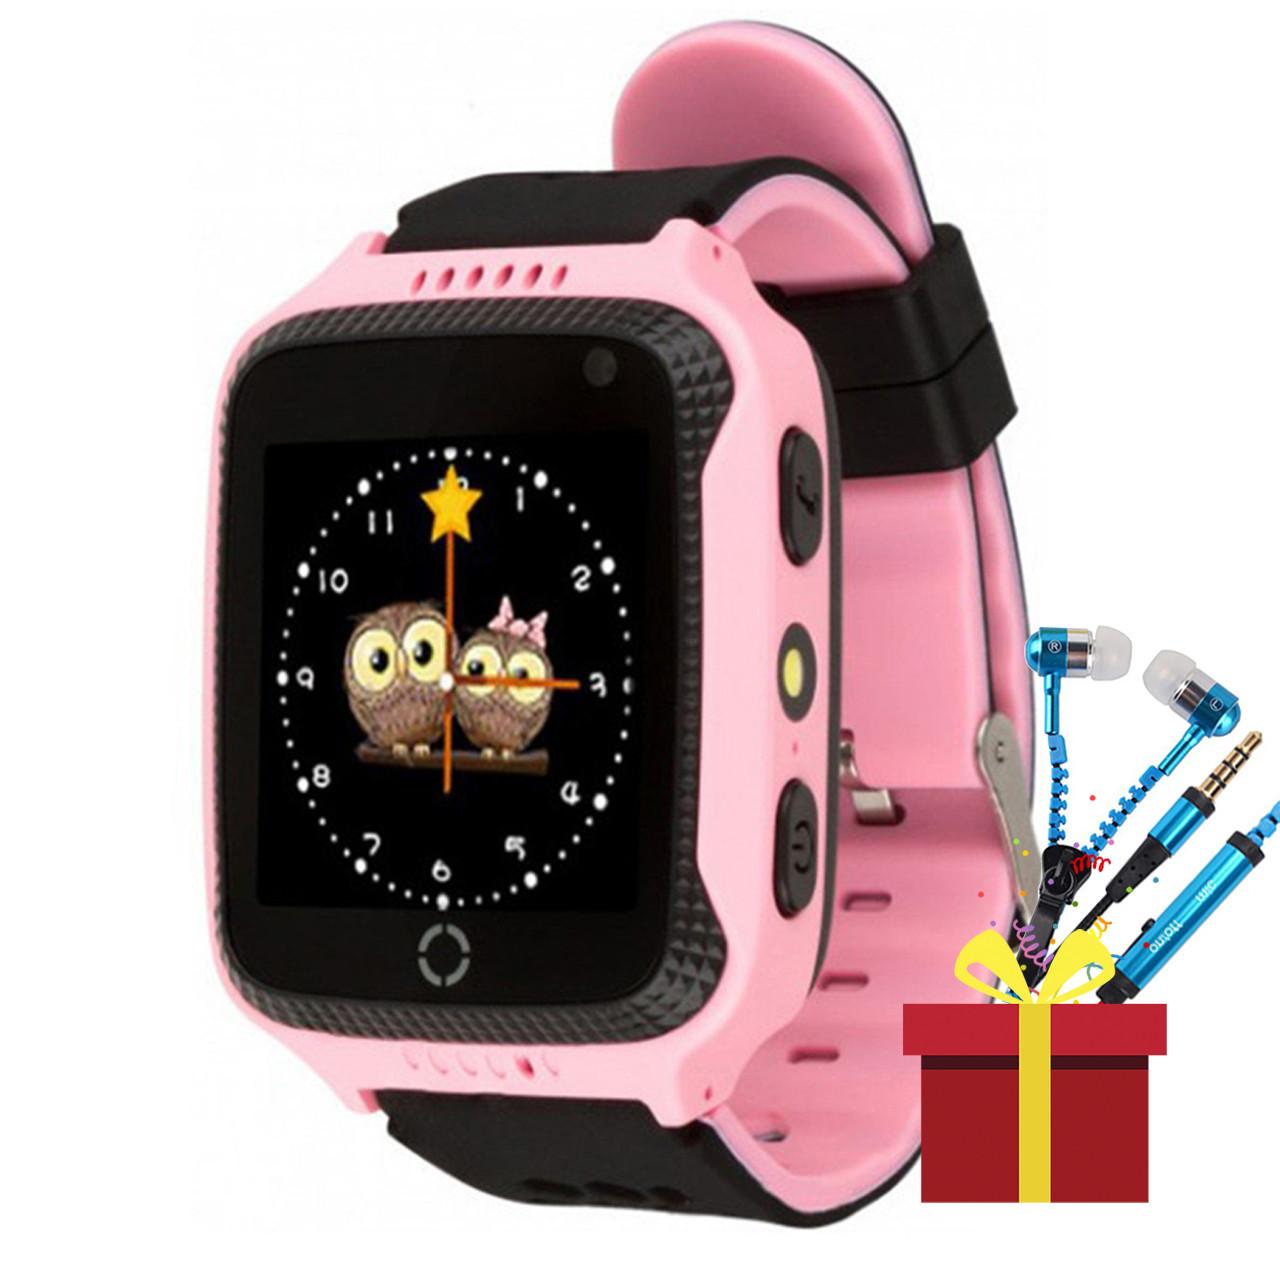 Смарт-часы Smart Baby UWatch Q529 с GPS трекером Pink (2964-8039)